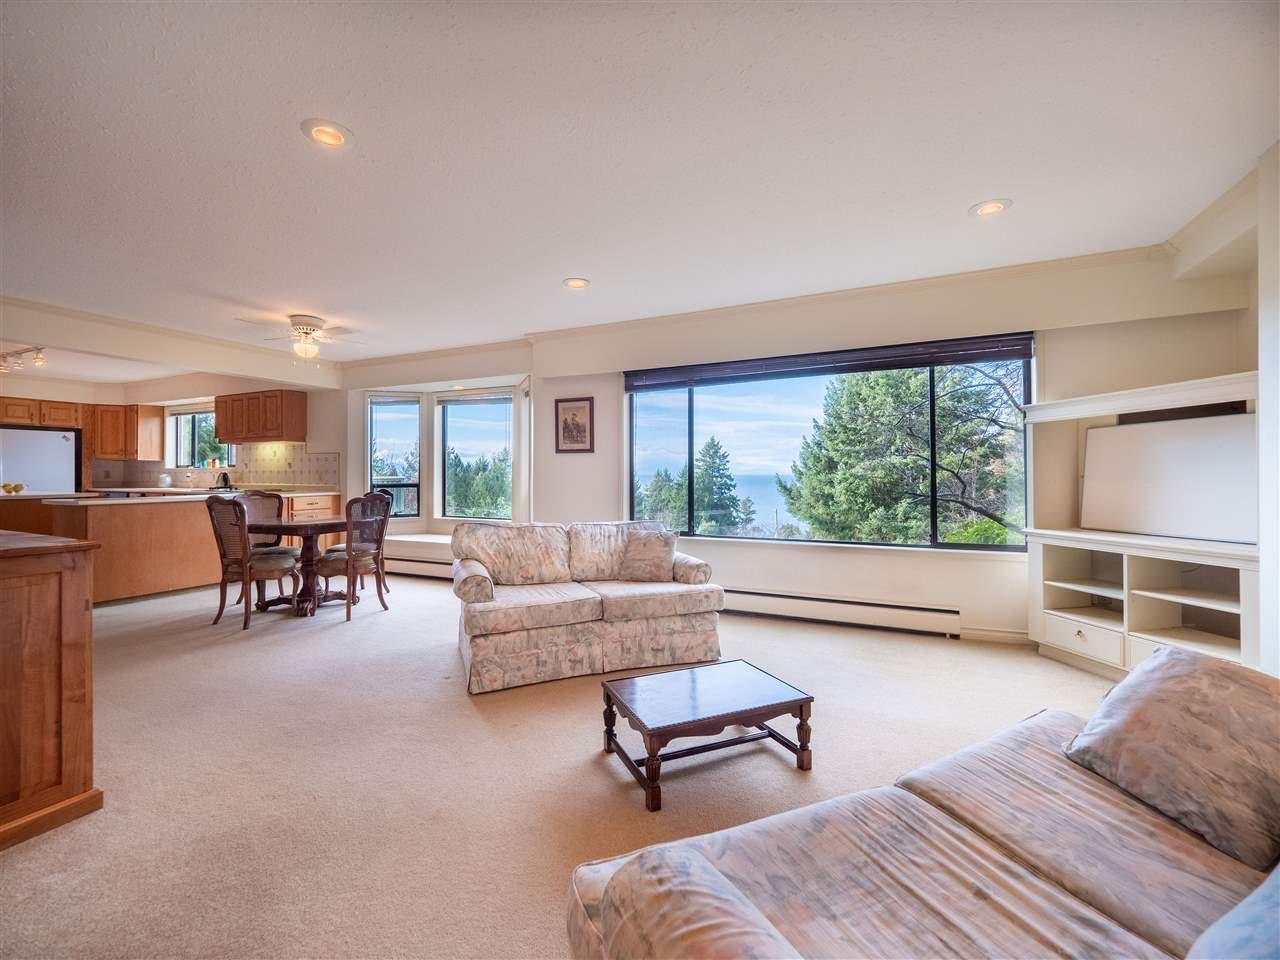 Photo 8: Photos: 5107 RADCLIFFE Road in Sechelt: Sechelt District House for sale (Sunshine Coast)  : MLS®# R2425277